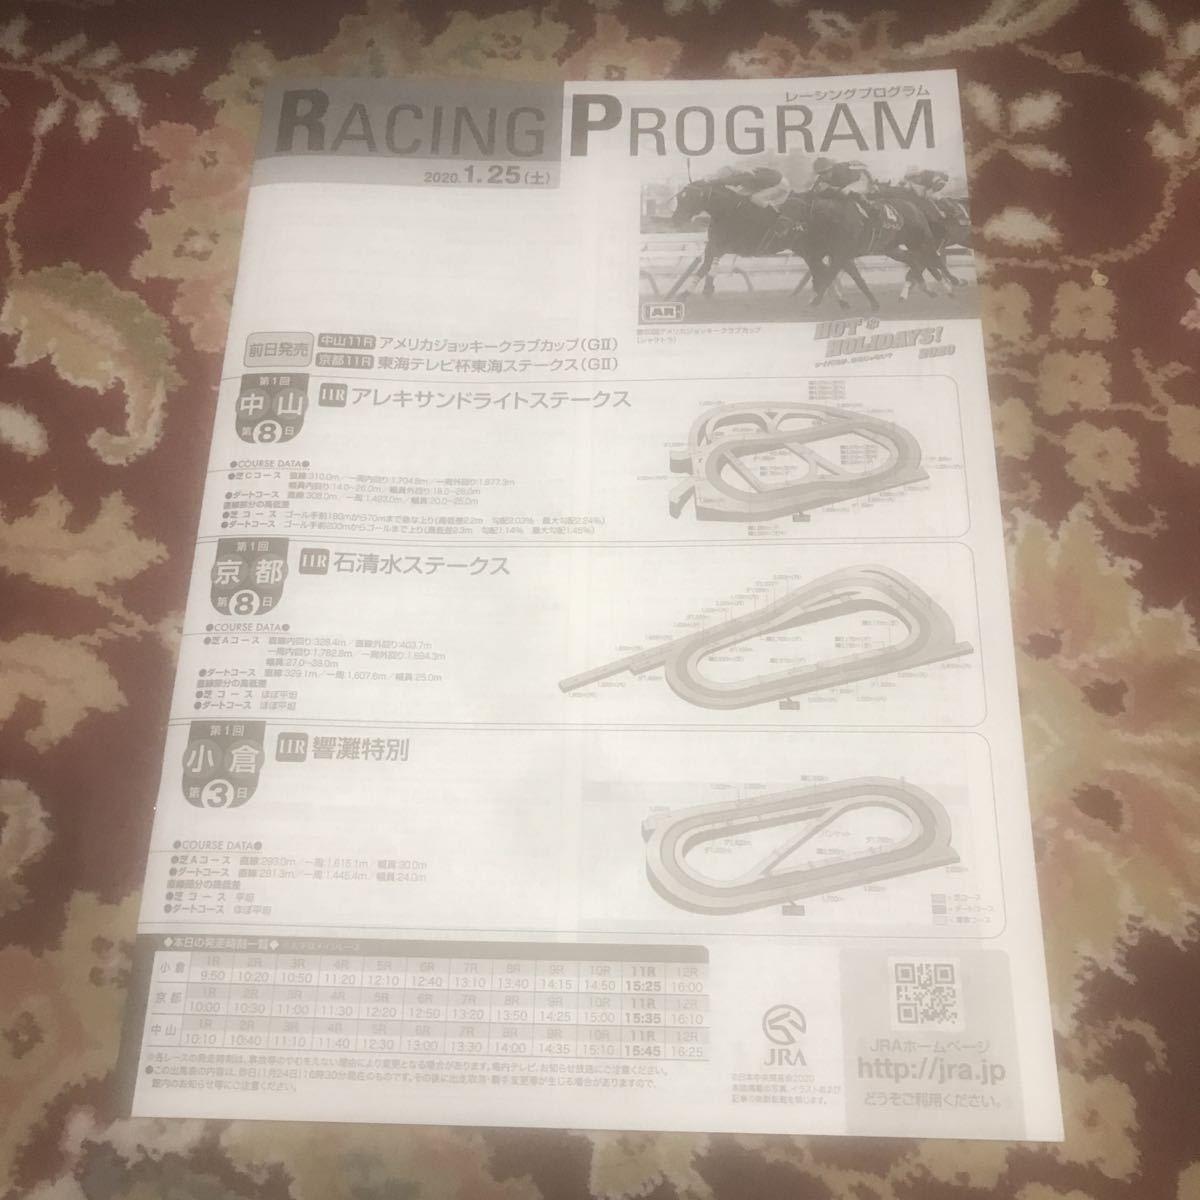 JRAレーシングプログラム2020.1.25(土)アレキサンドライトステークス、石清水ステークス、響灘特別_画像1